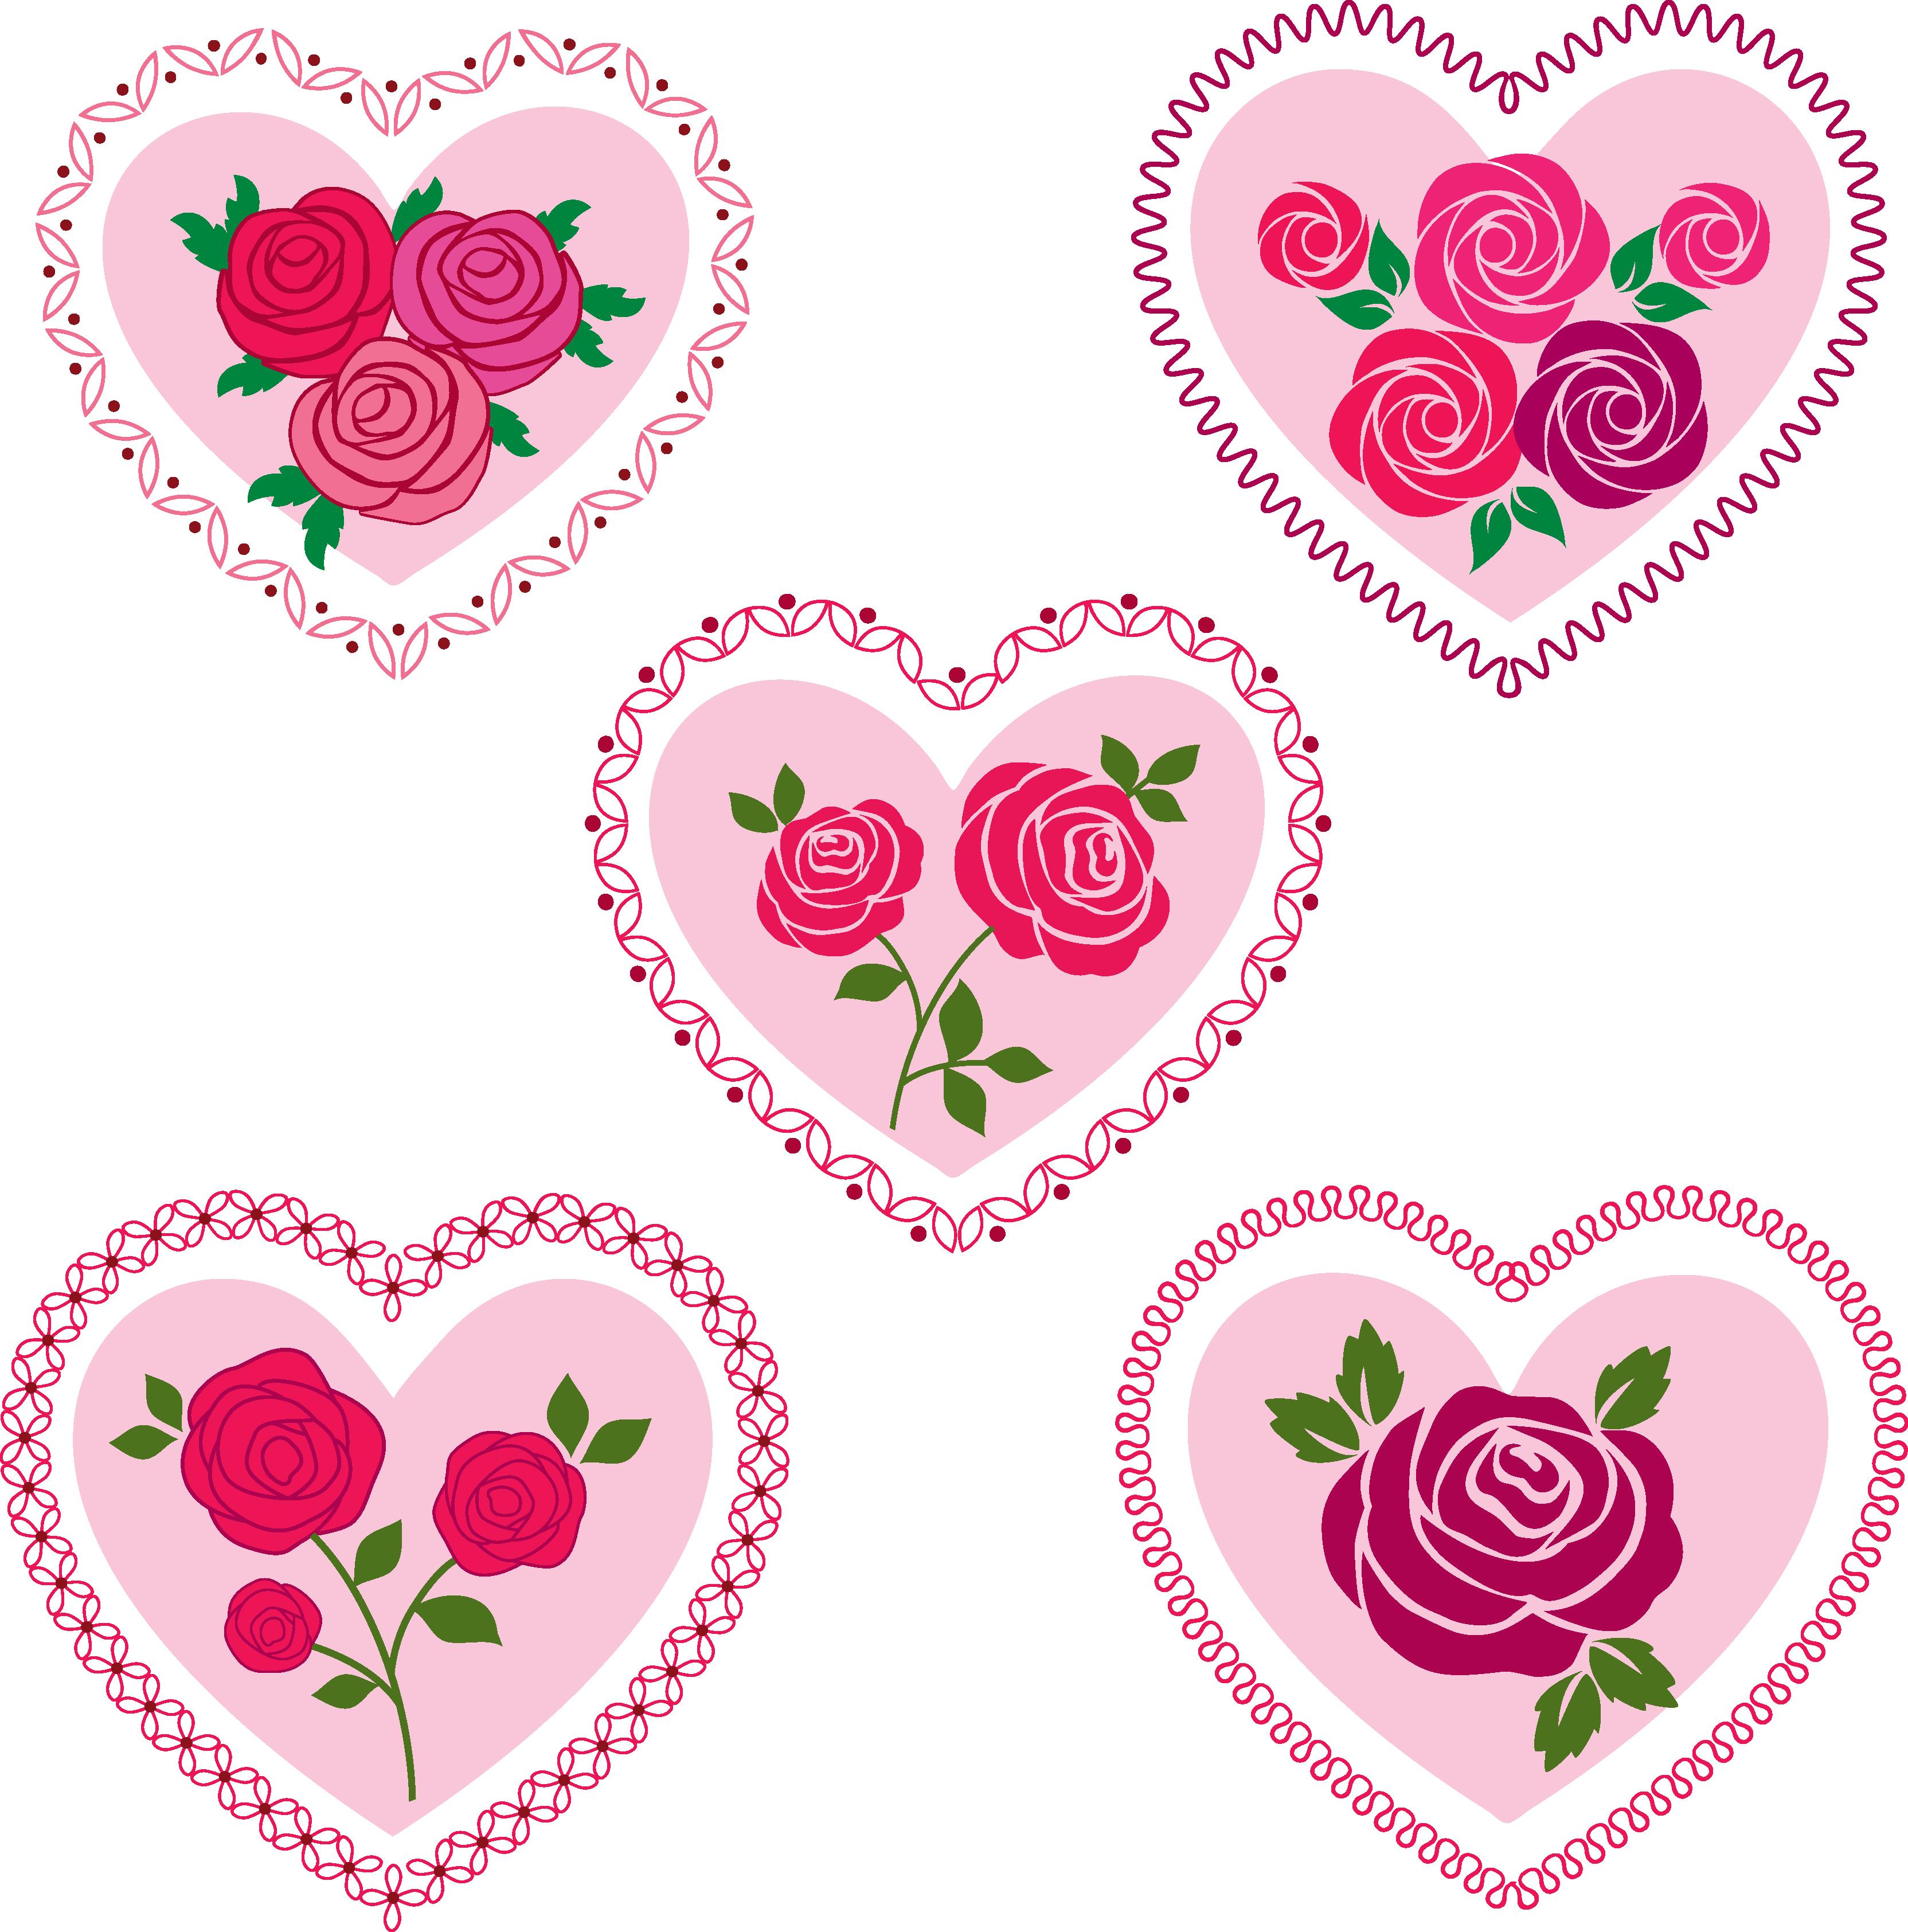 rose valentine hearts clipart - Download Free Vectors ...